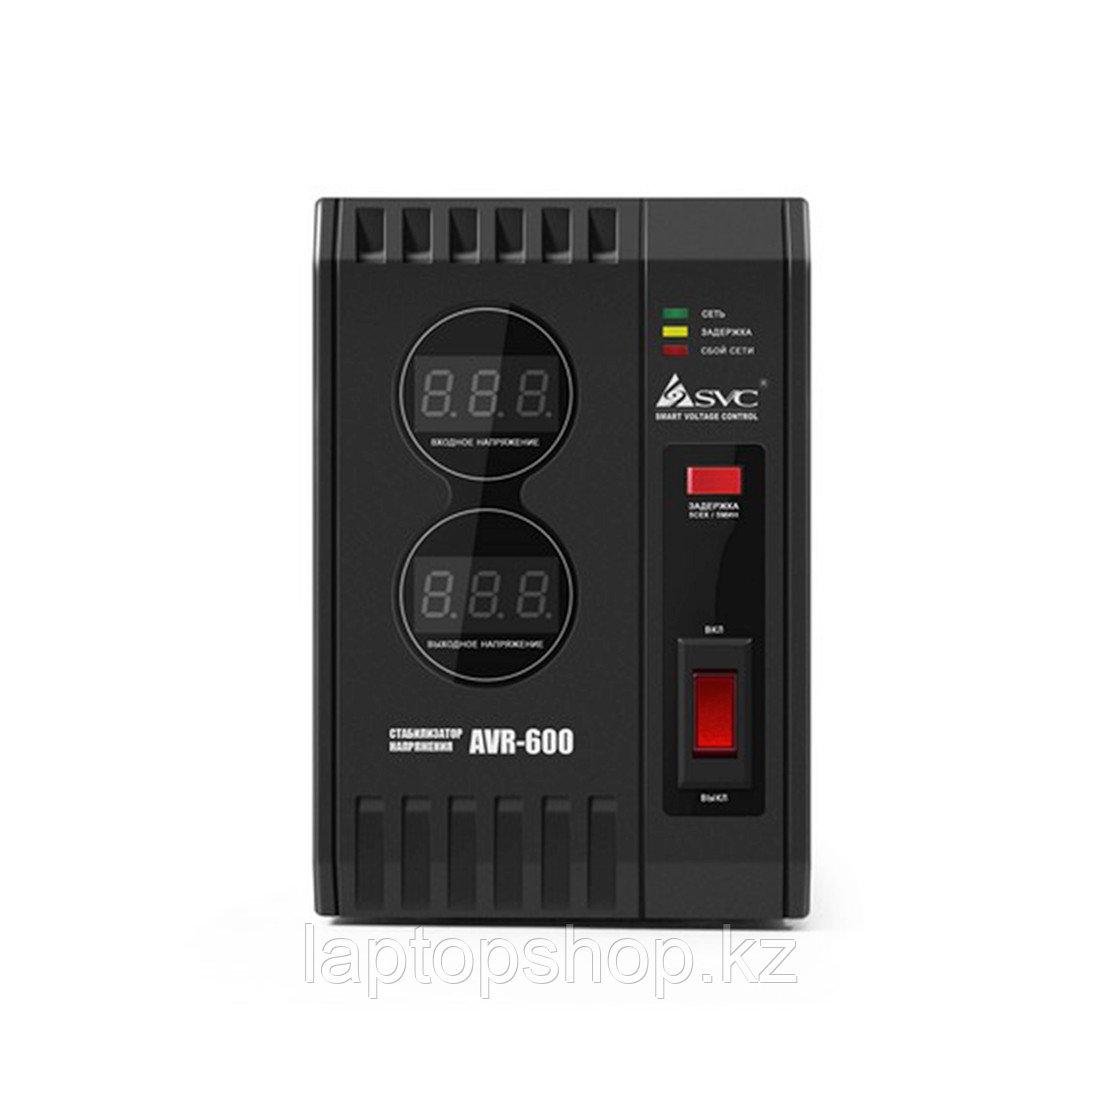 Стабилизатор (AVR) SVC AVR-600, Мощность 600ВА/600Вт